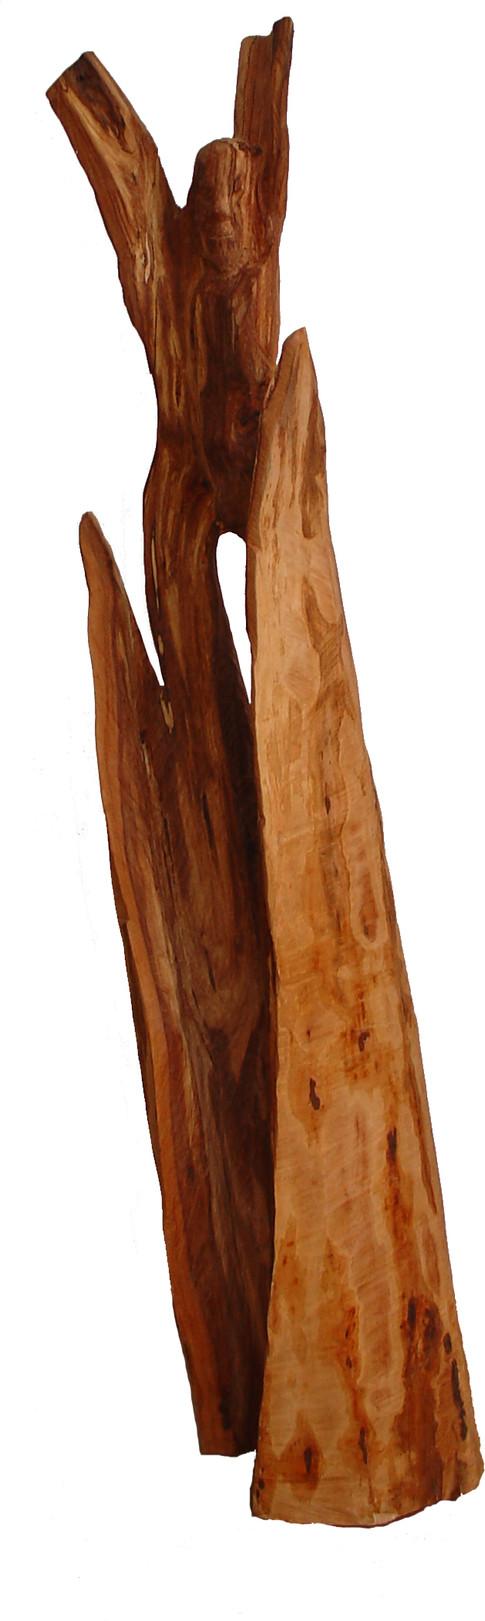 Ursprung I - Höhe ca. 175 cm